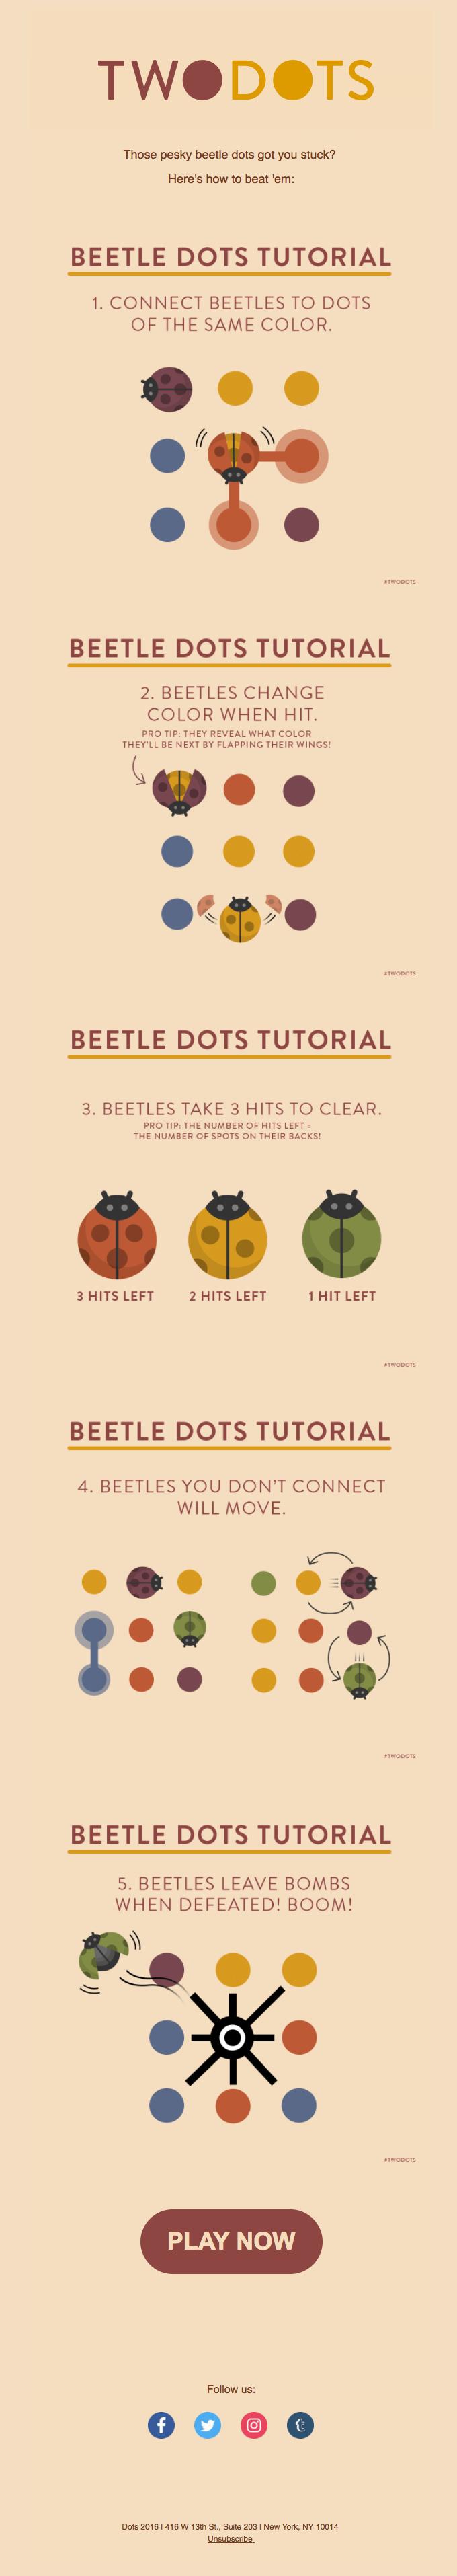 Beetle dots tutorial